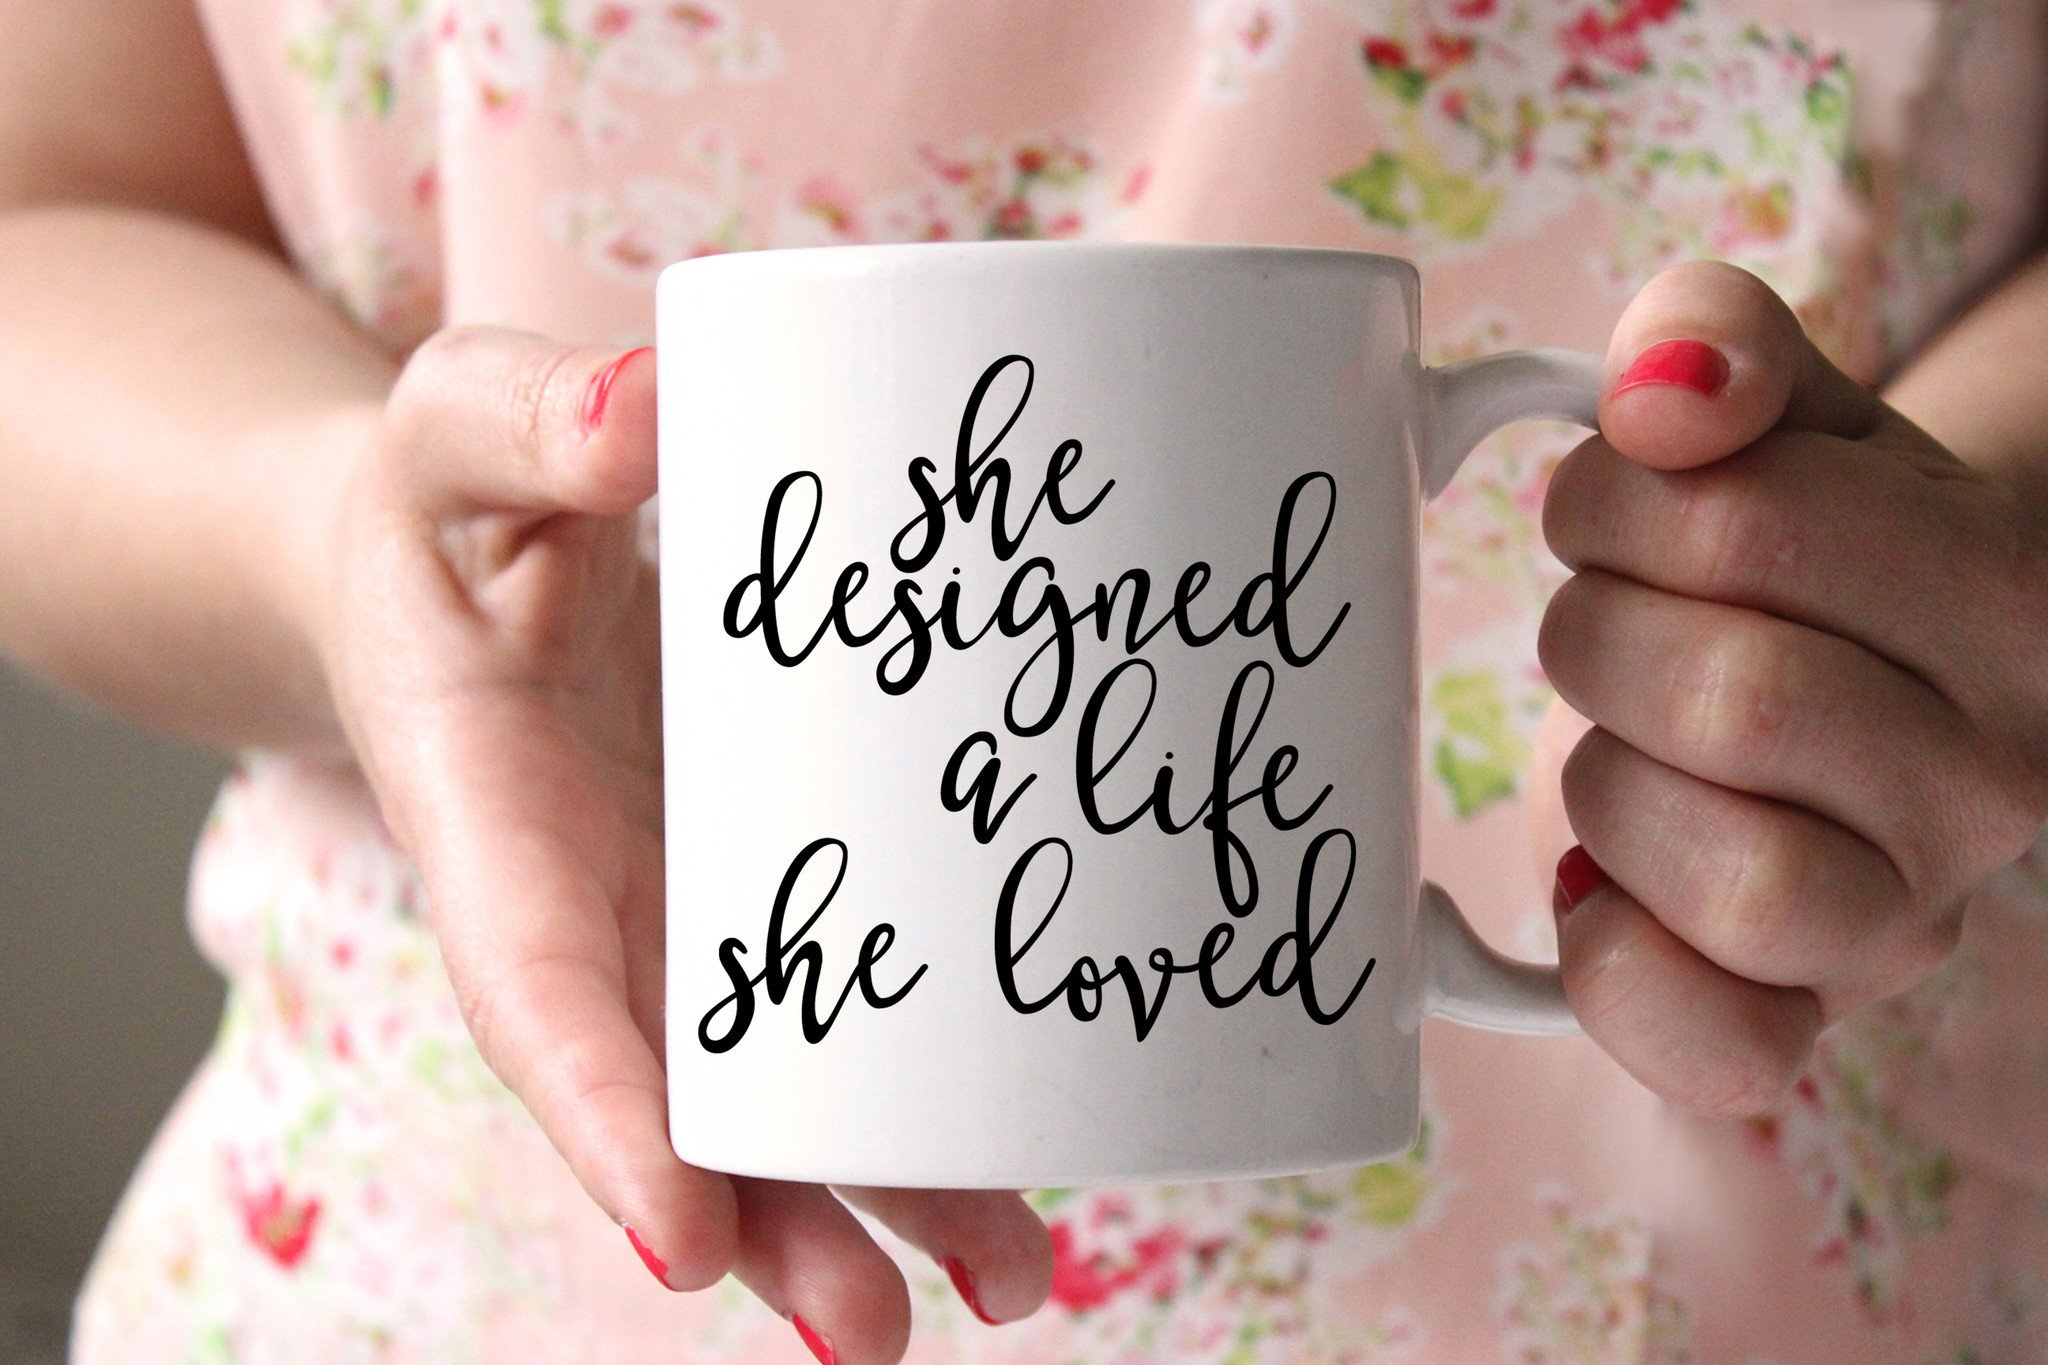 She_Designed_a_Life_She_Loved_Mug_2048x@2x